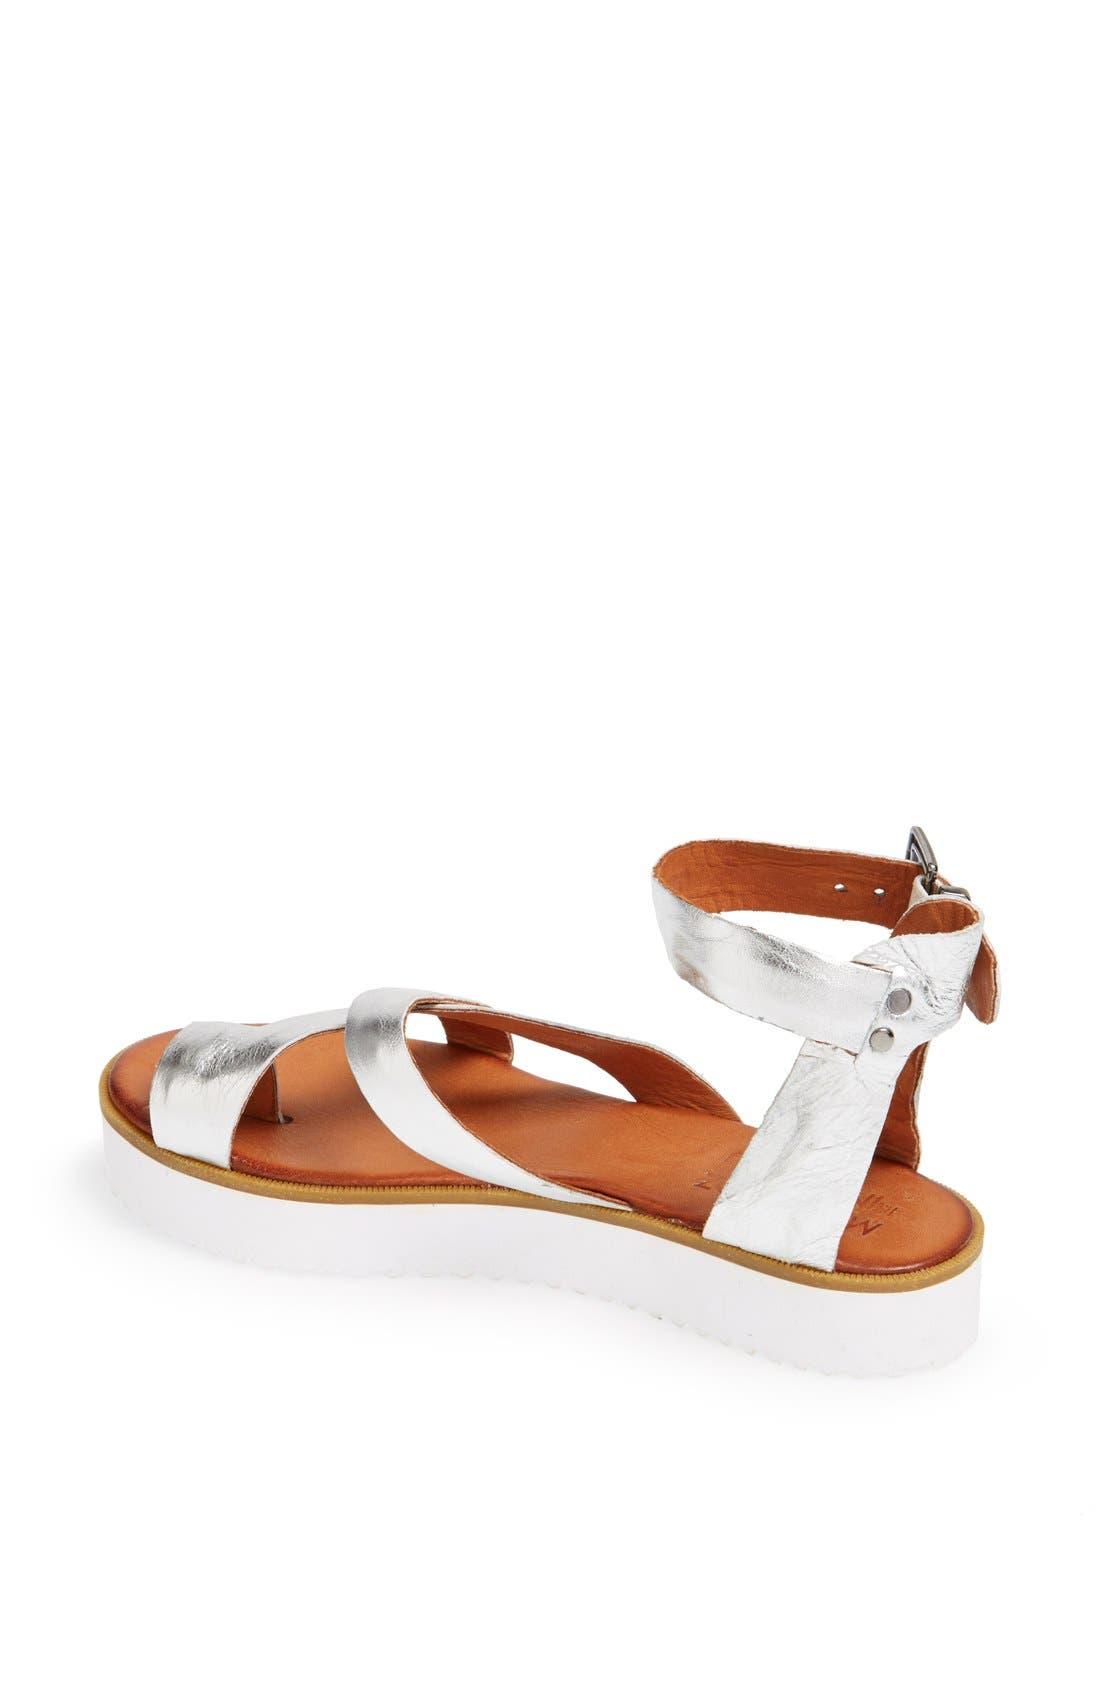 Alternate Image 2  - Miz Mooz 'Gable' Sandal